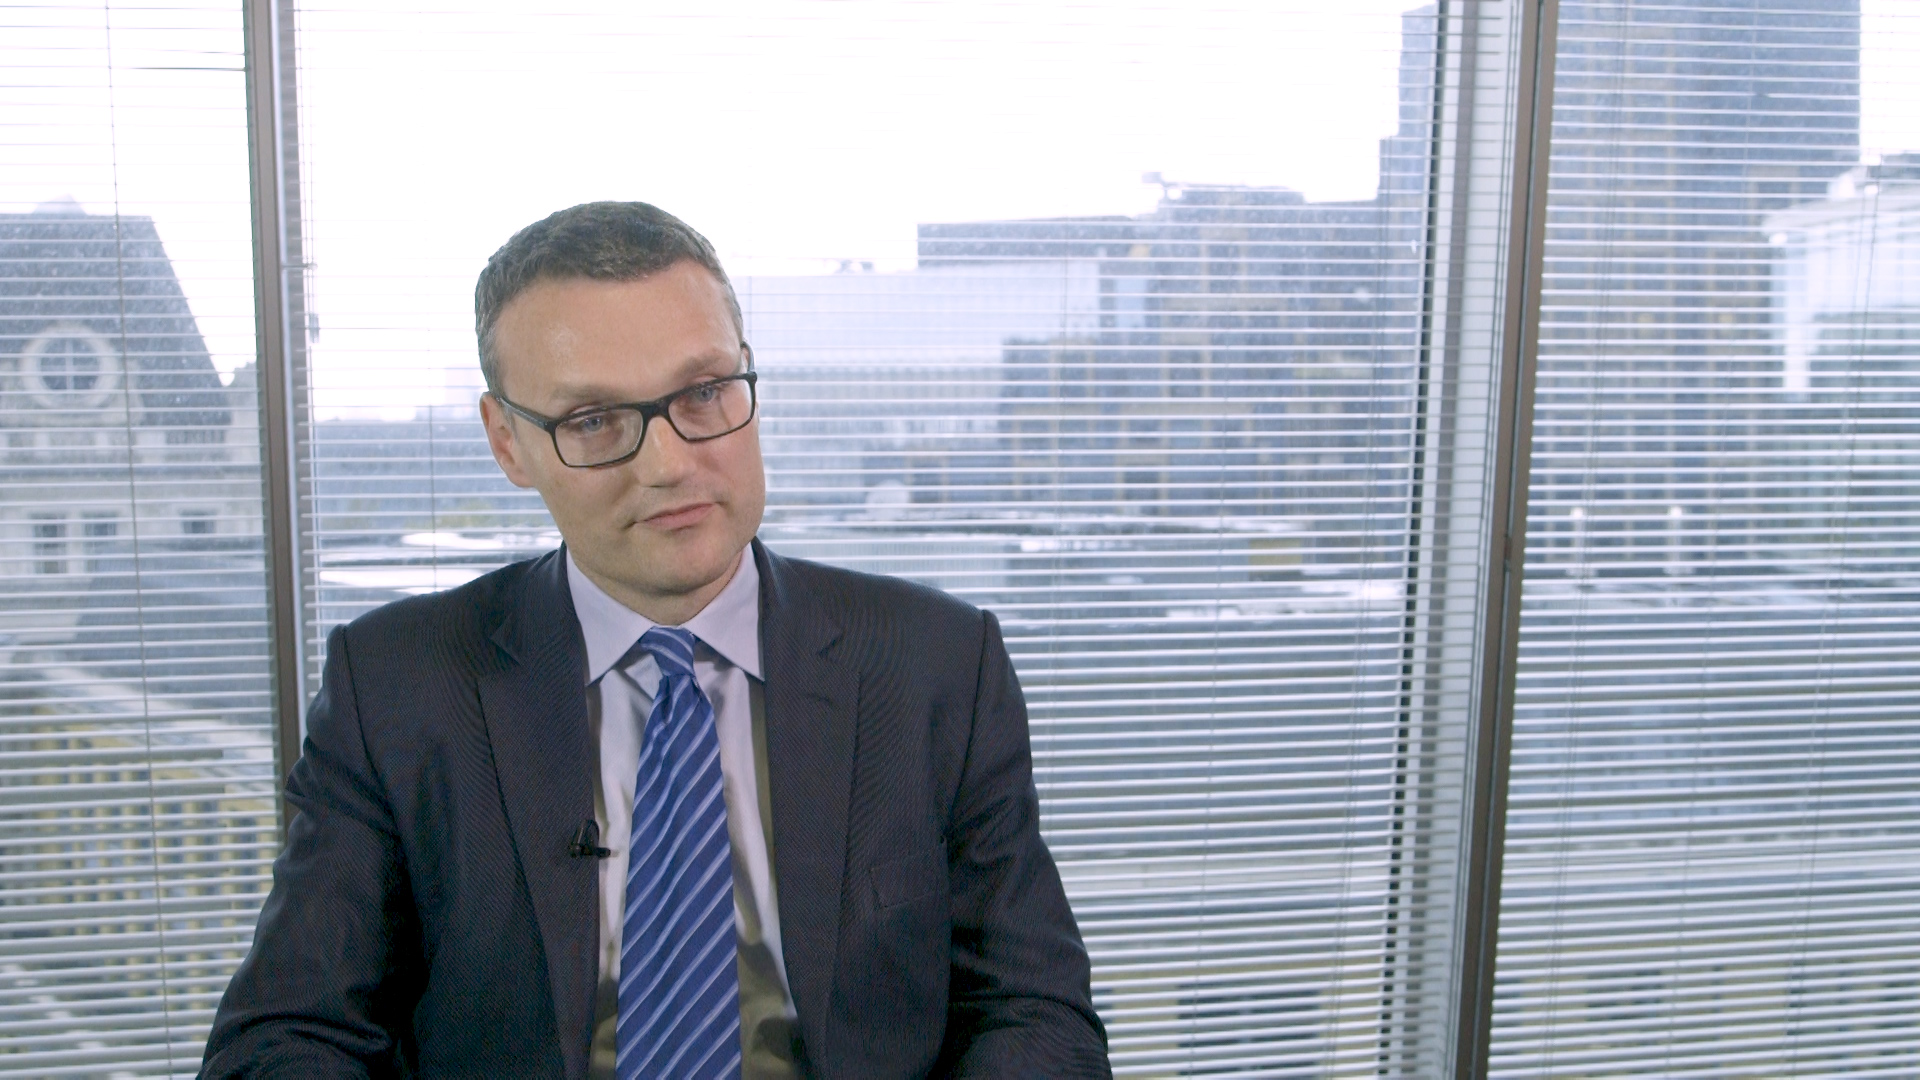 Simon Kenyon, Managing Director of Consumer Banking at Lloyds Banking Group.